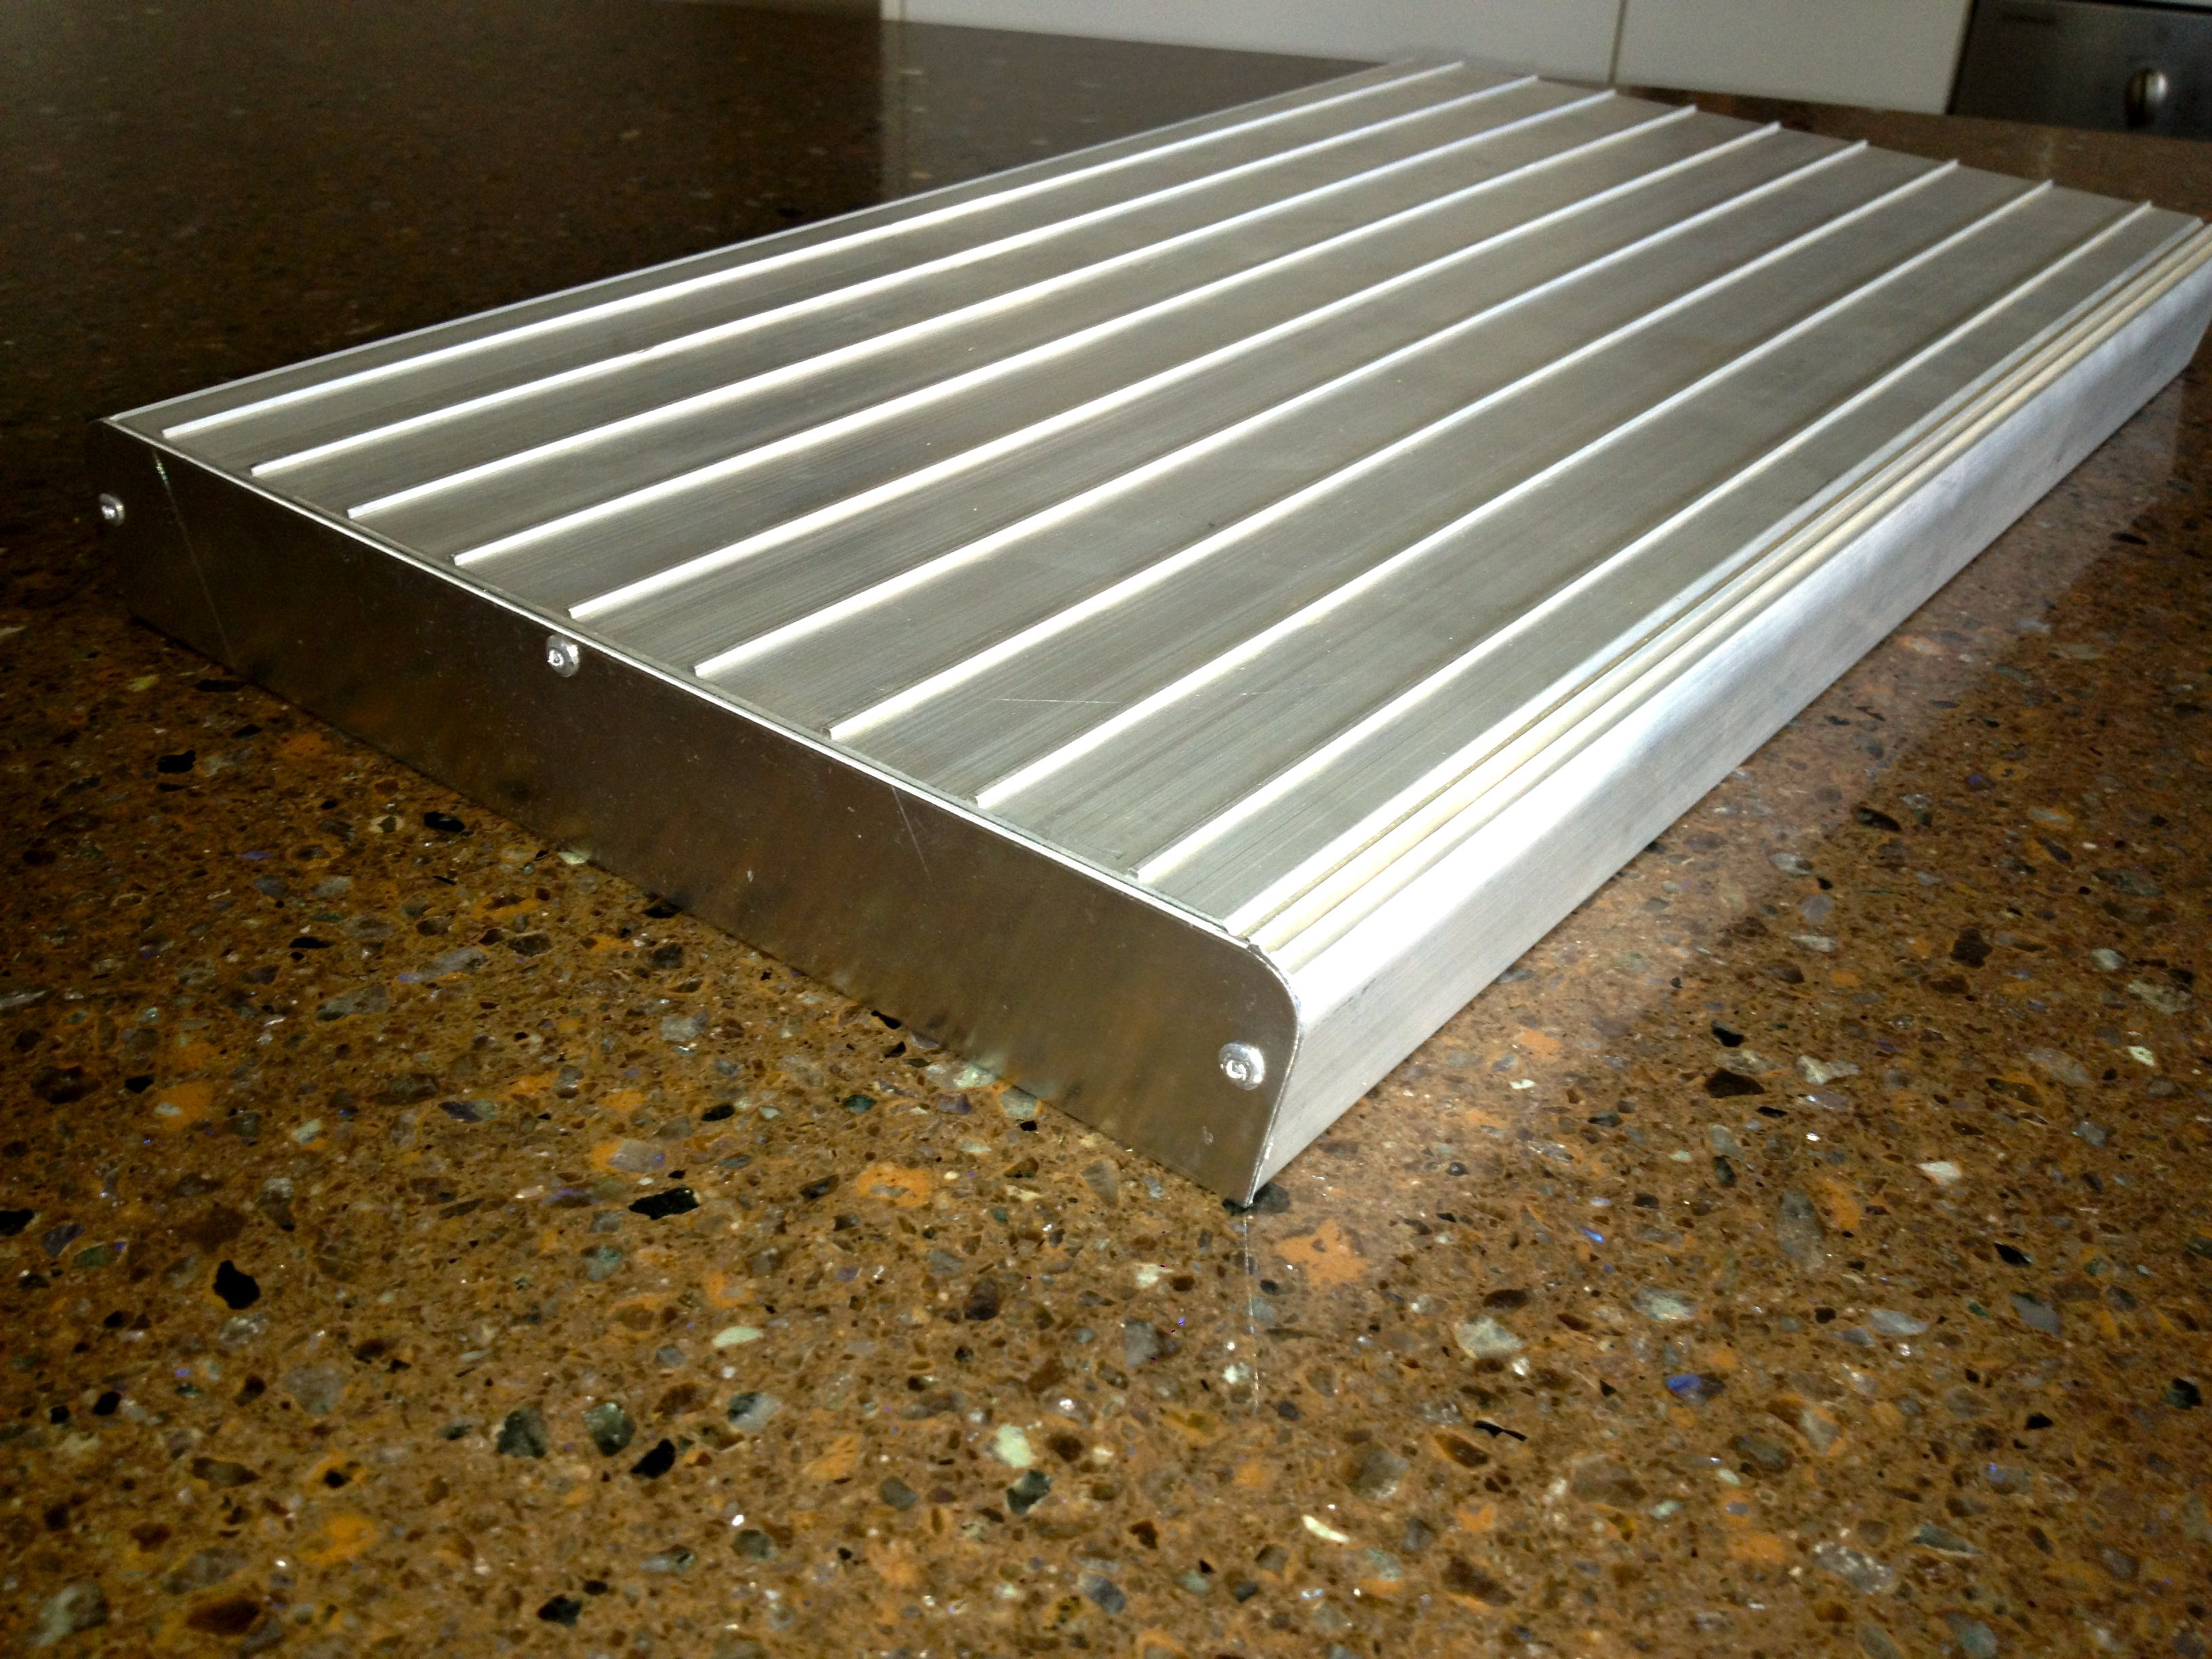 Aluminium Stair Treads Ipswich Area Steps Per Metre Miscellaneous Qld Ipswich 2620036